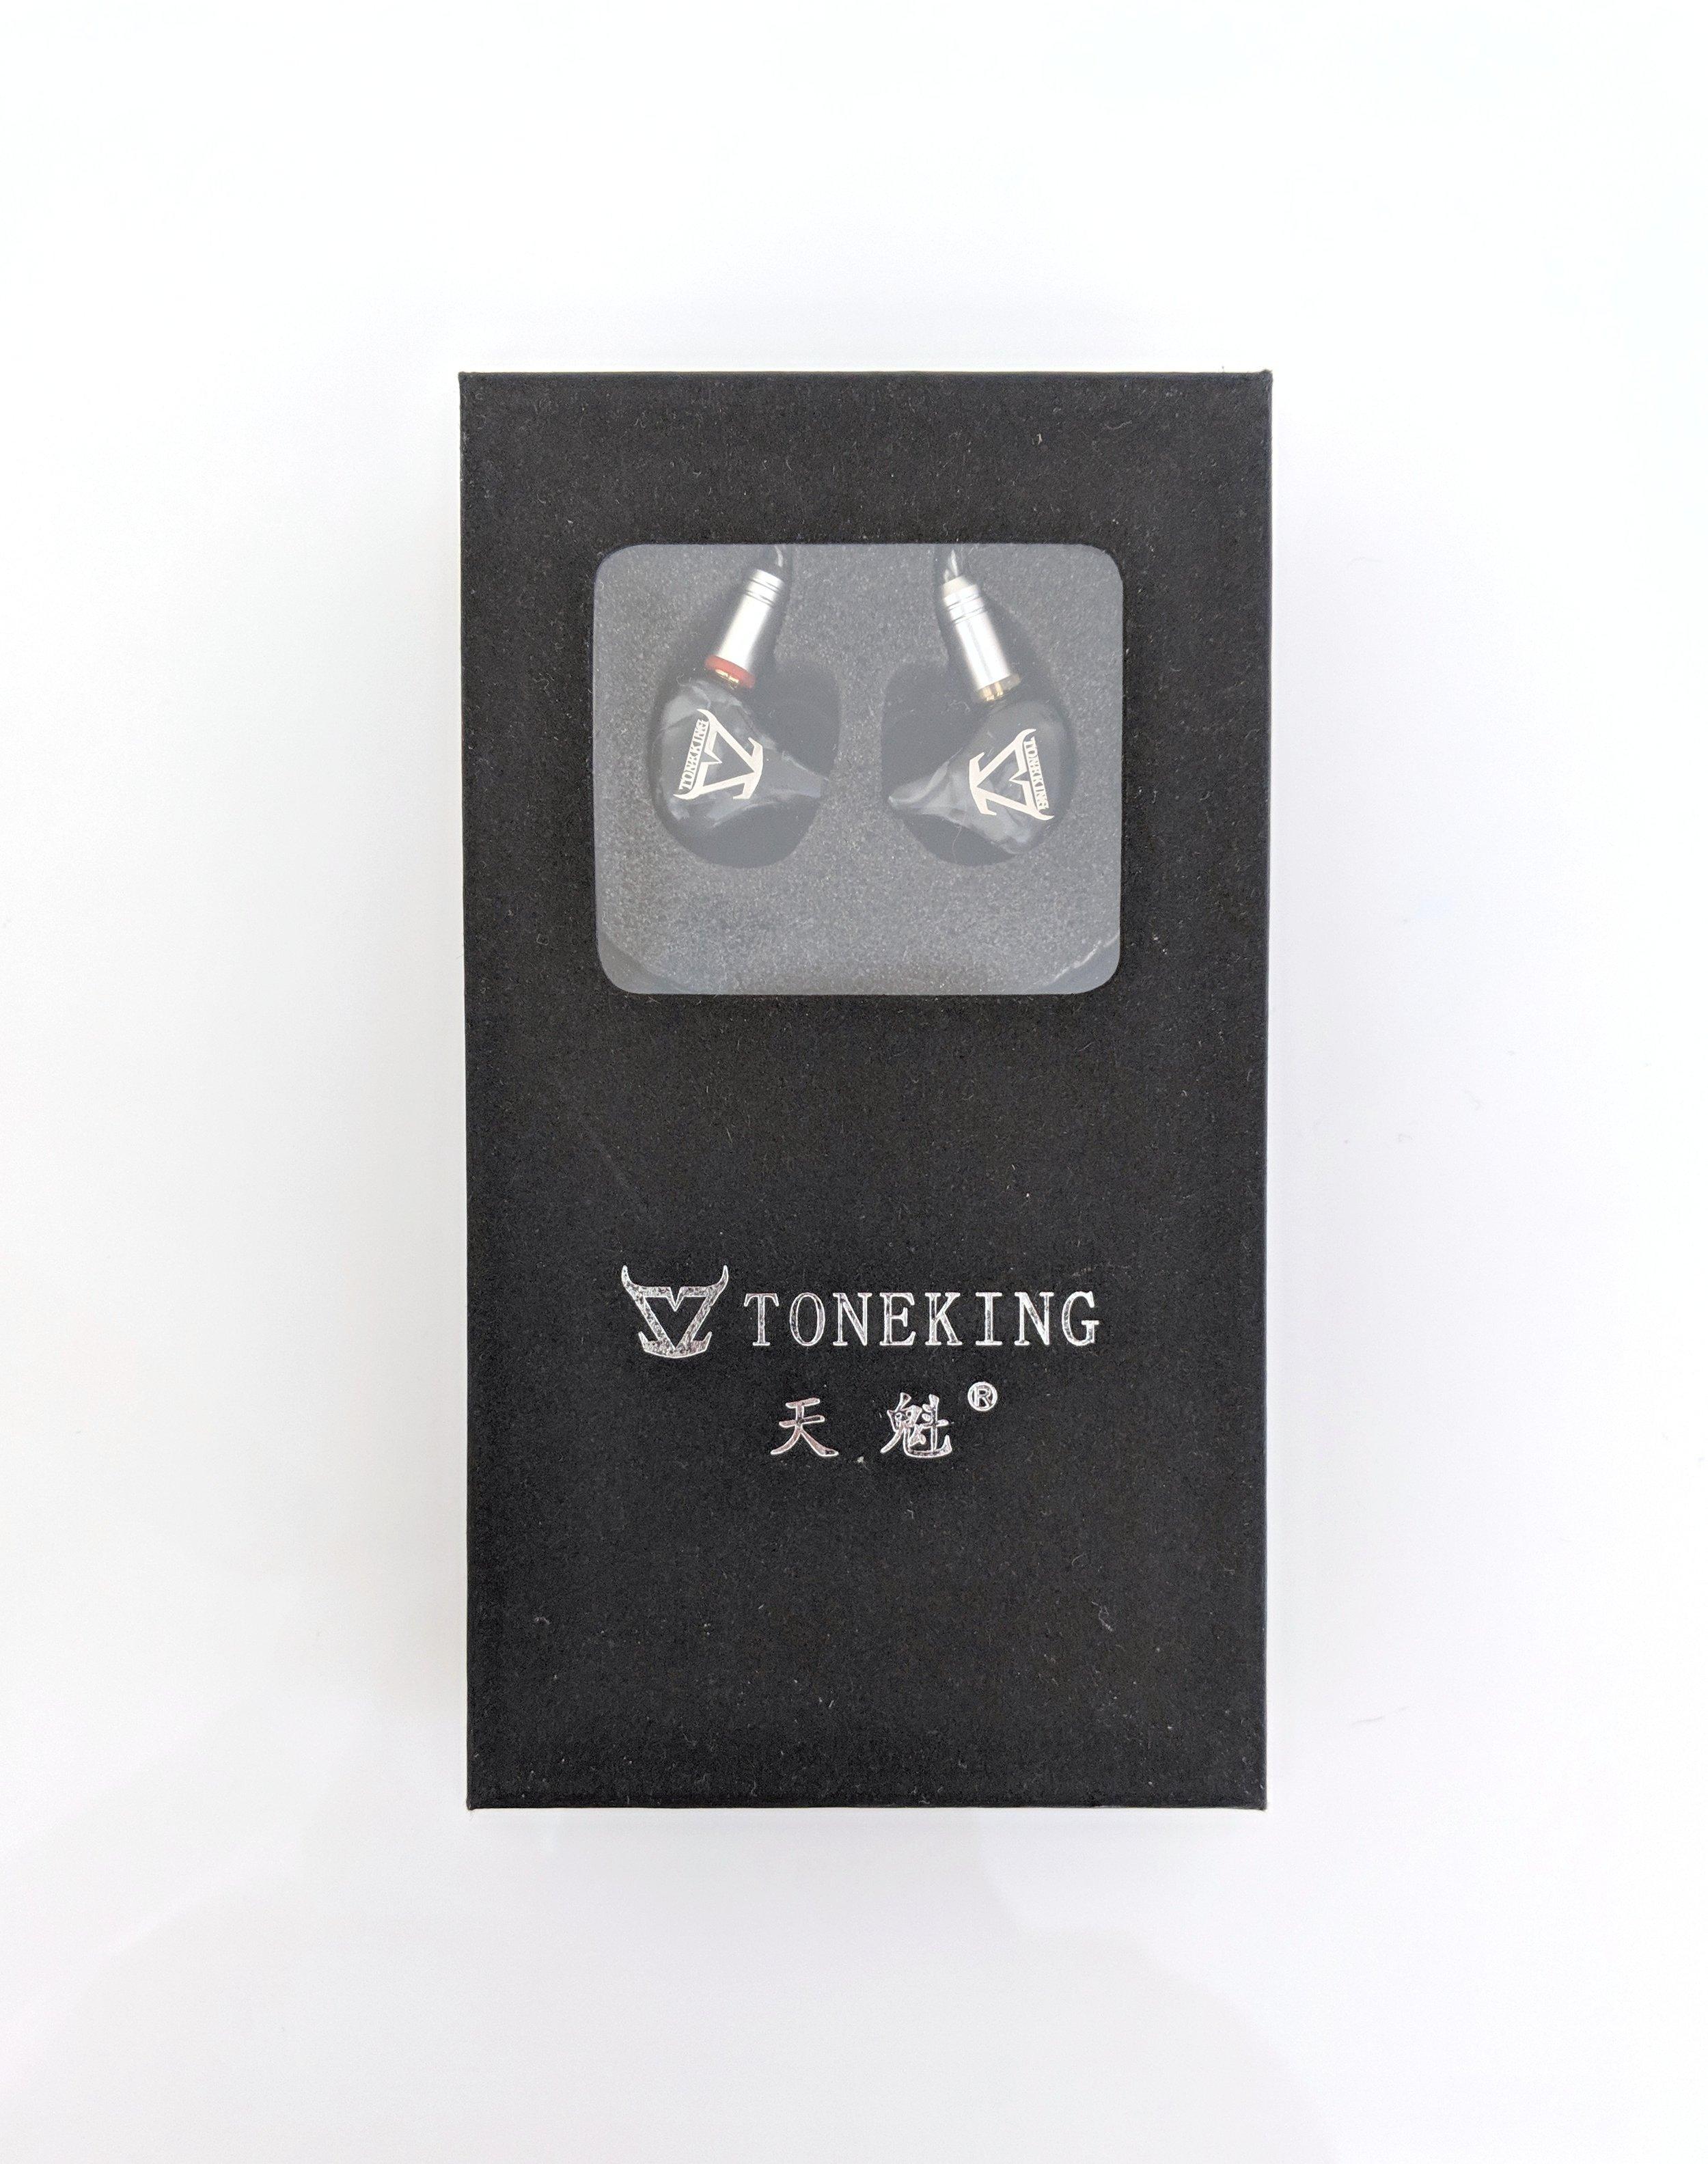 Toneking T4 box